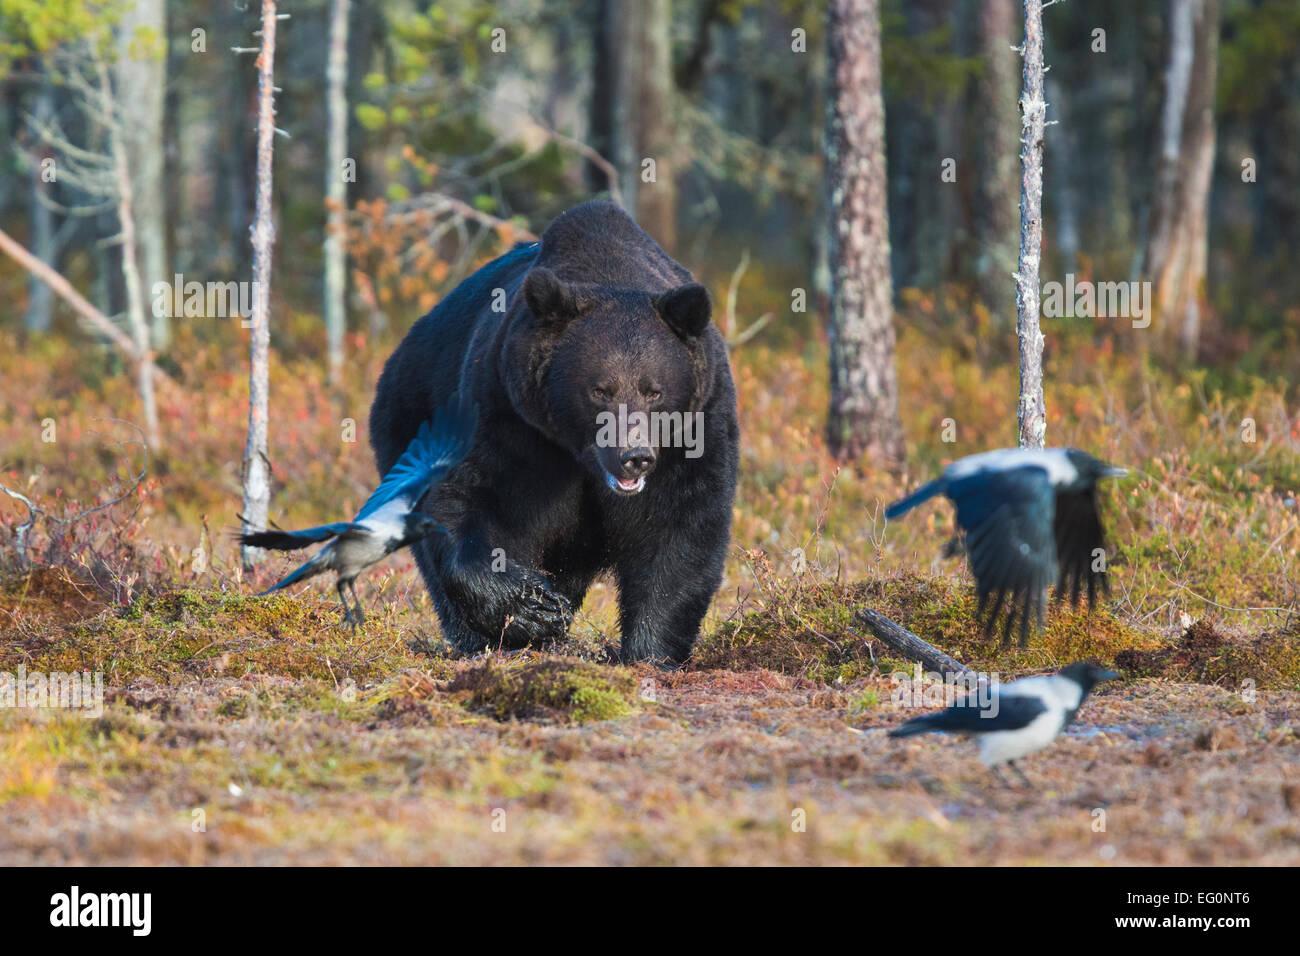 Großer Braunbär Ursus Arctos aus Wald und Krähen laufen weg, Kuhmo, Finnland Stockbild